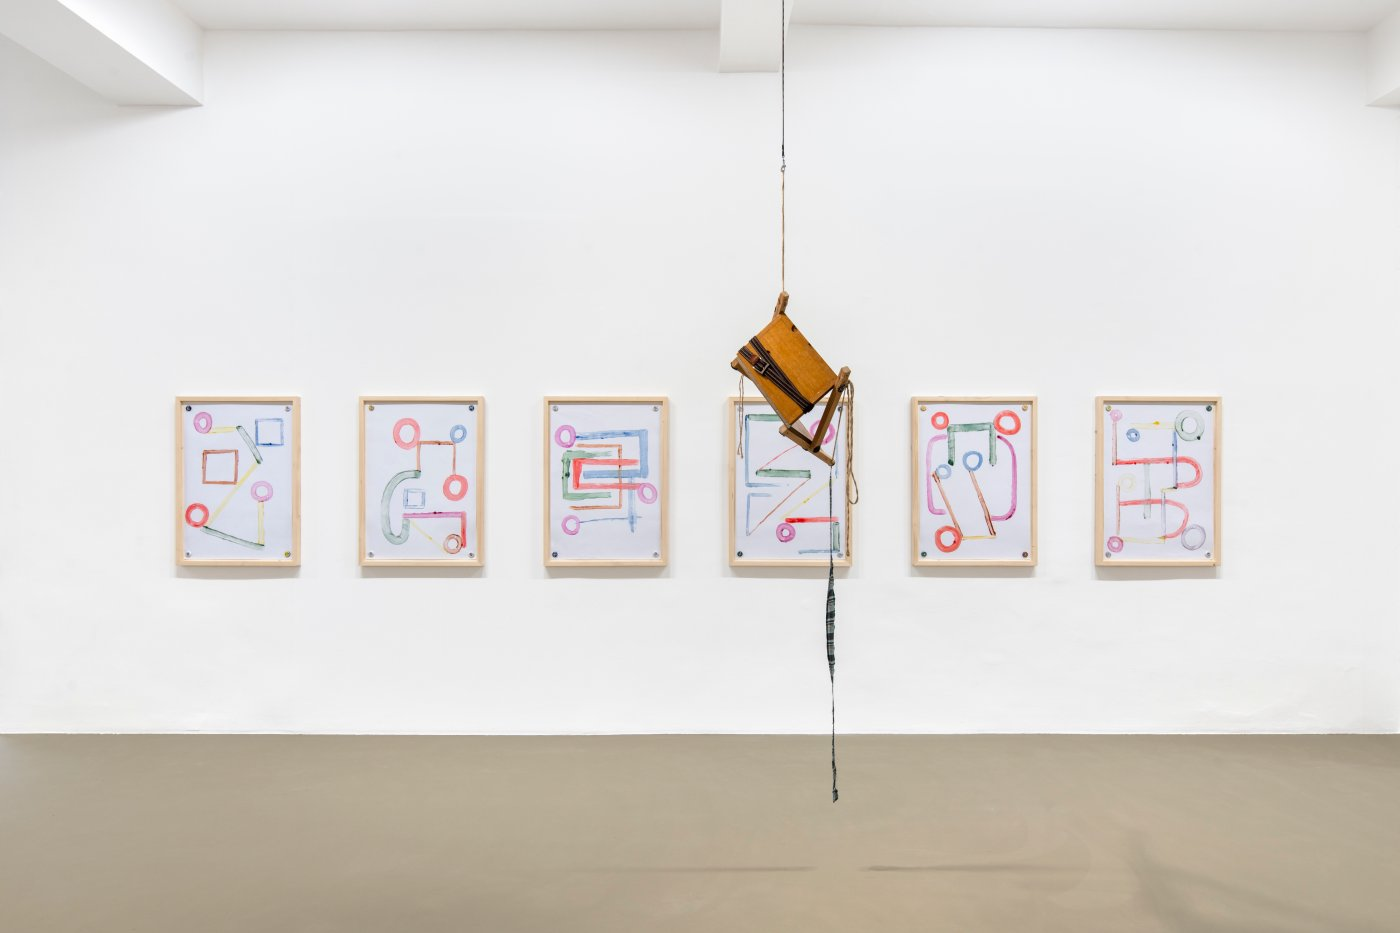 Galerie Chantal Crousel Abraham Cruzvillegas 2